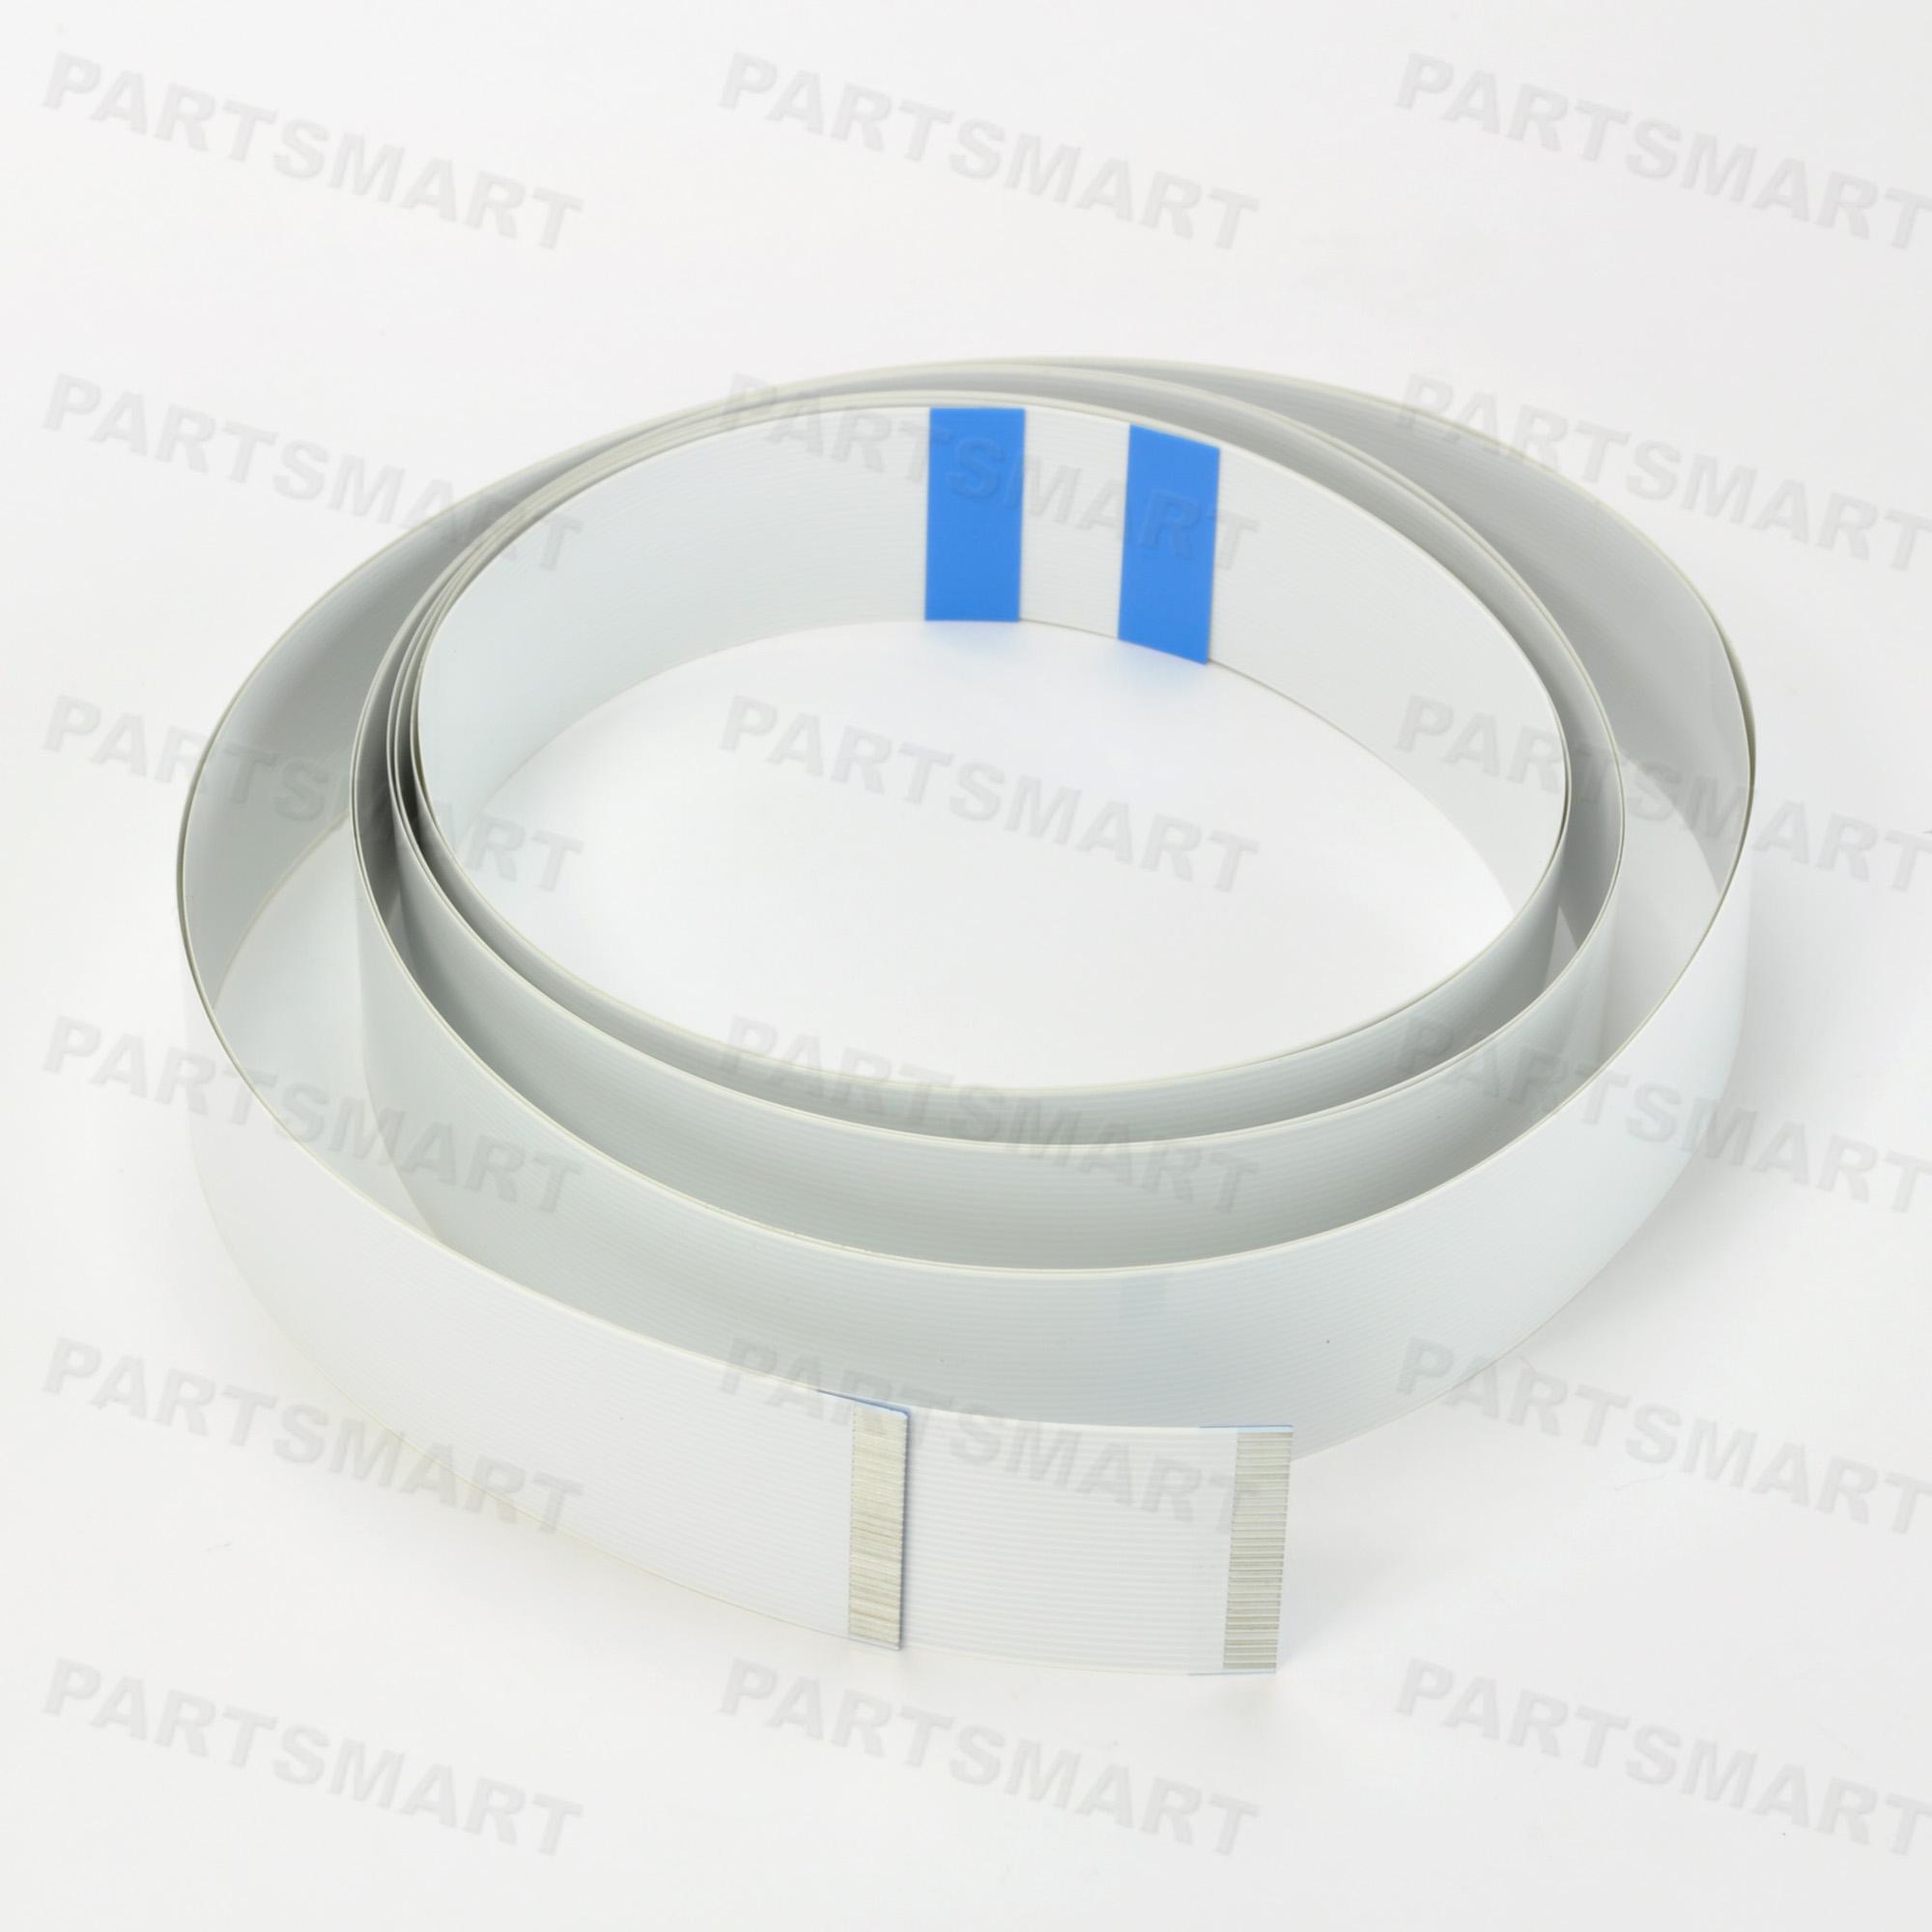 Hp Designjet 800 Plotter Parts Partsmart